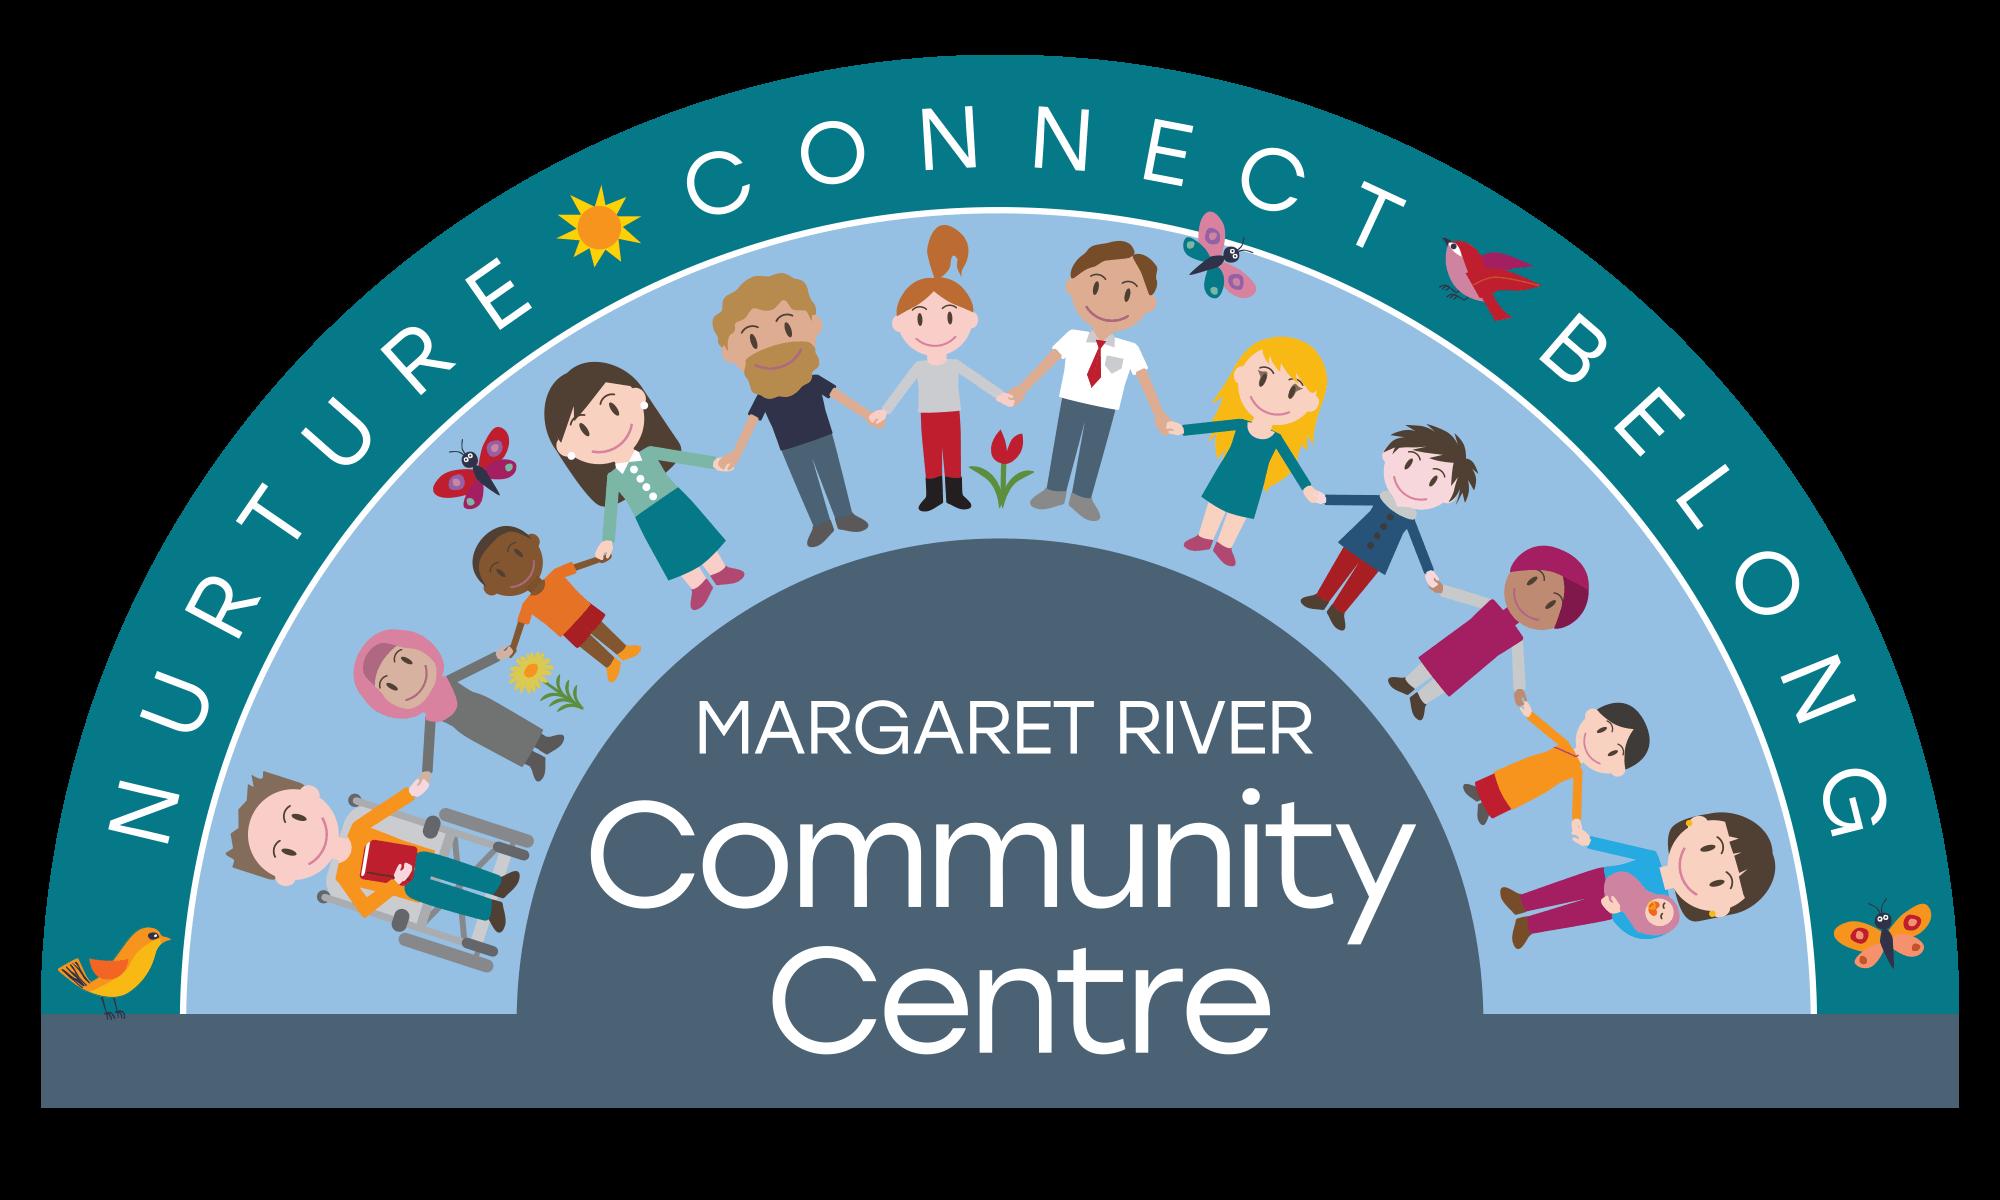 Margaret River Community Centre